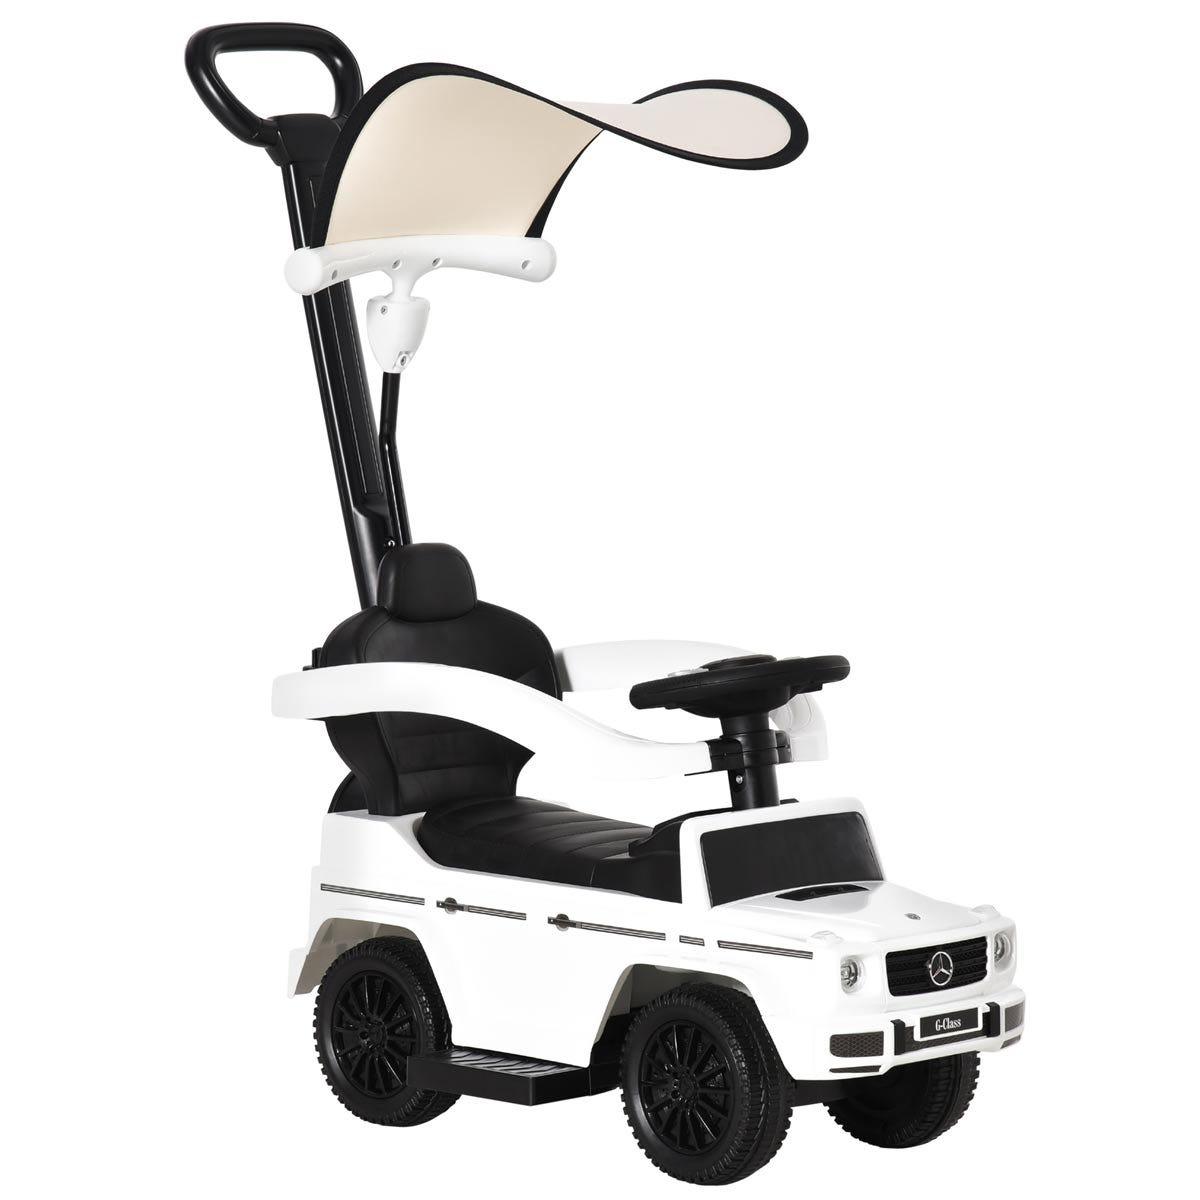 Reiten Kids Benz G350 Ride-on Sliding Car & Stroller - White